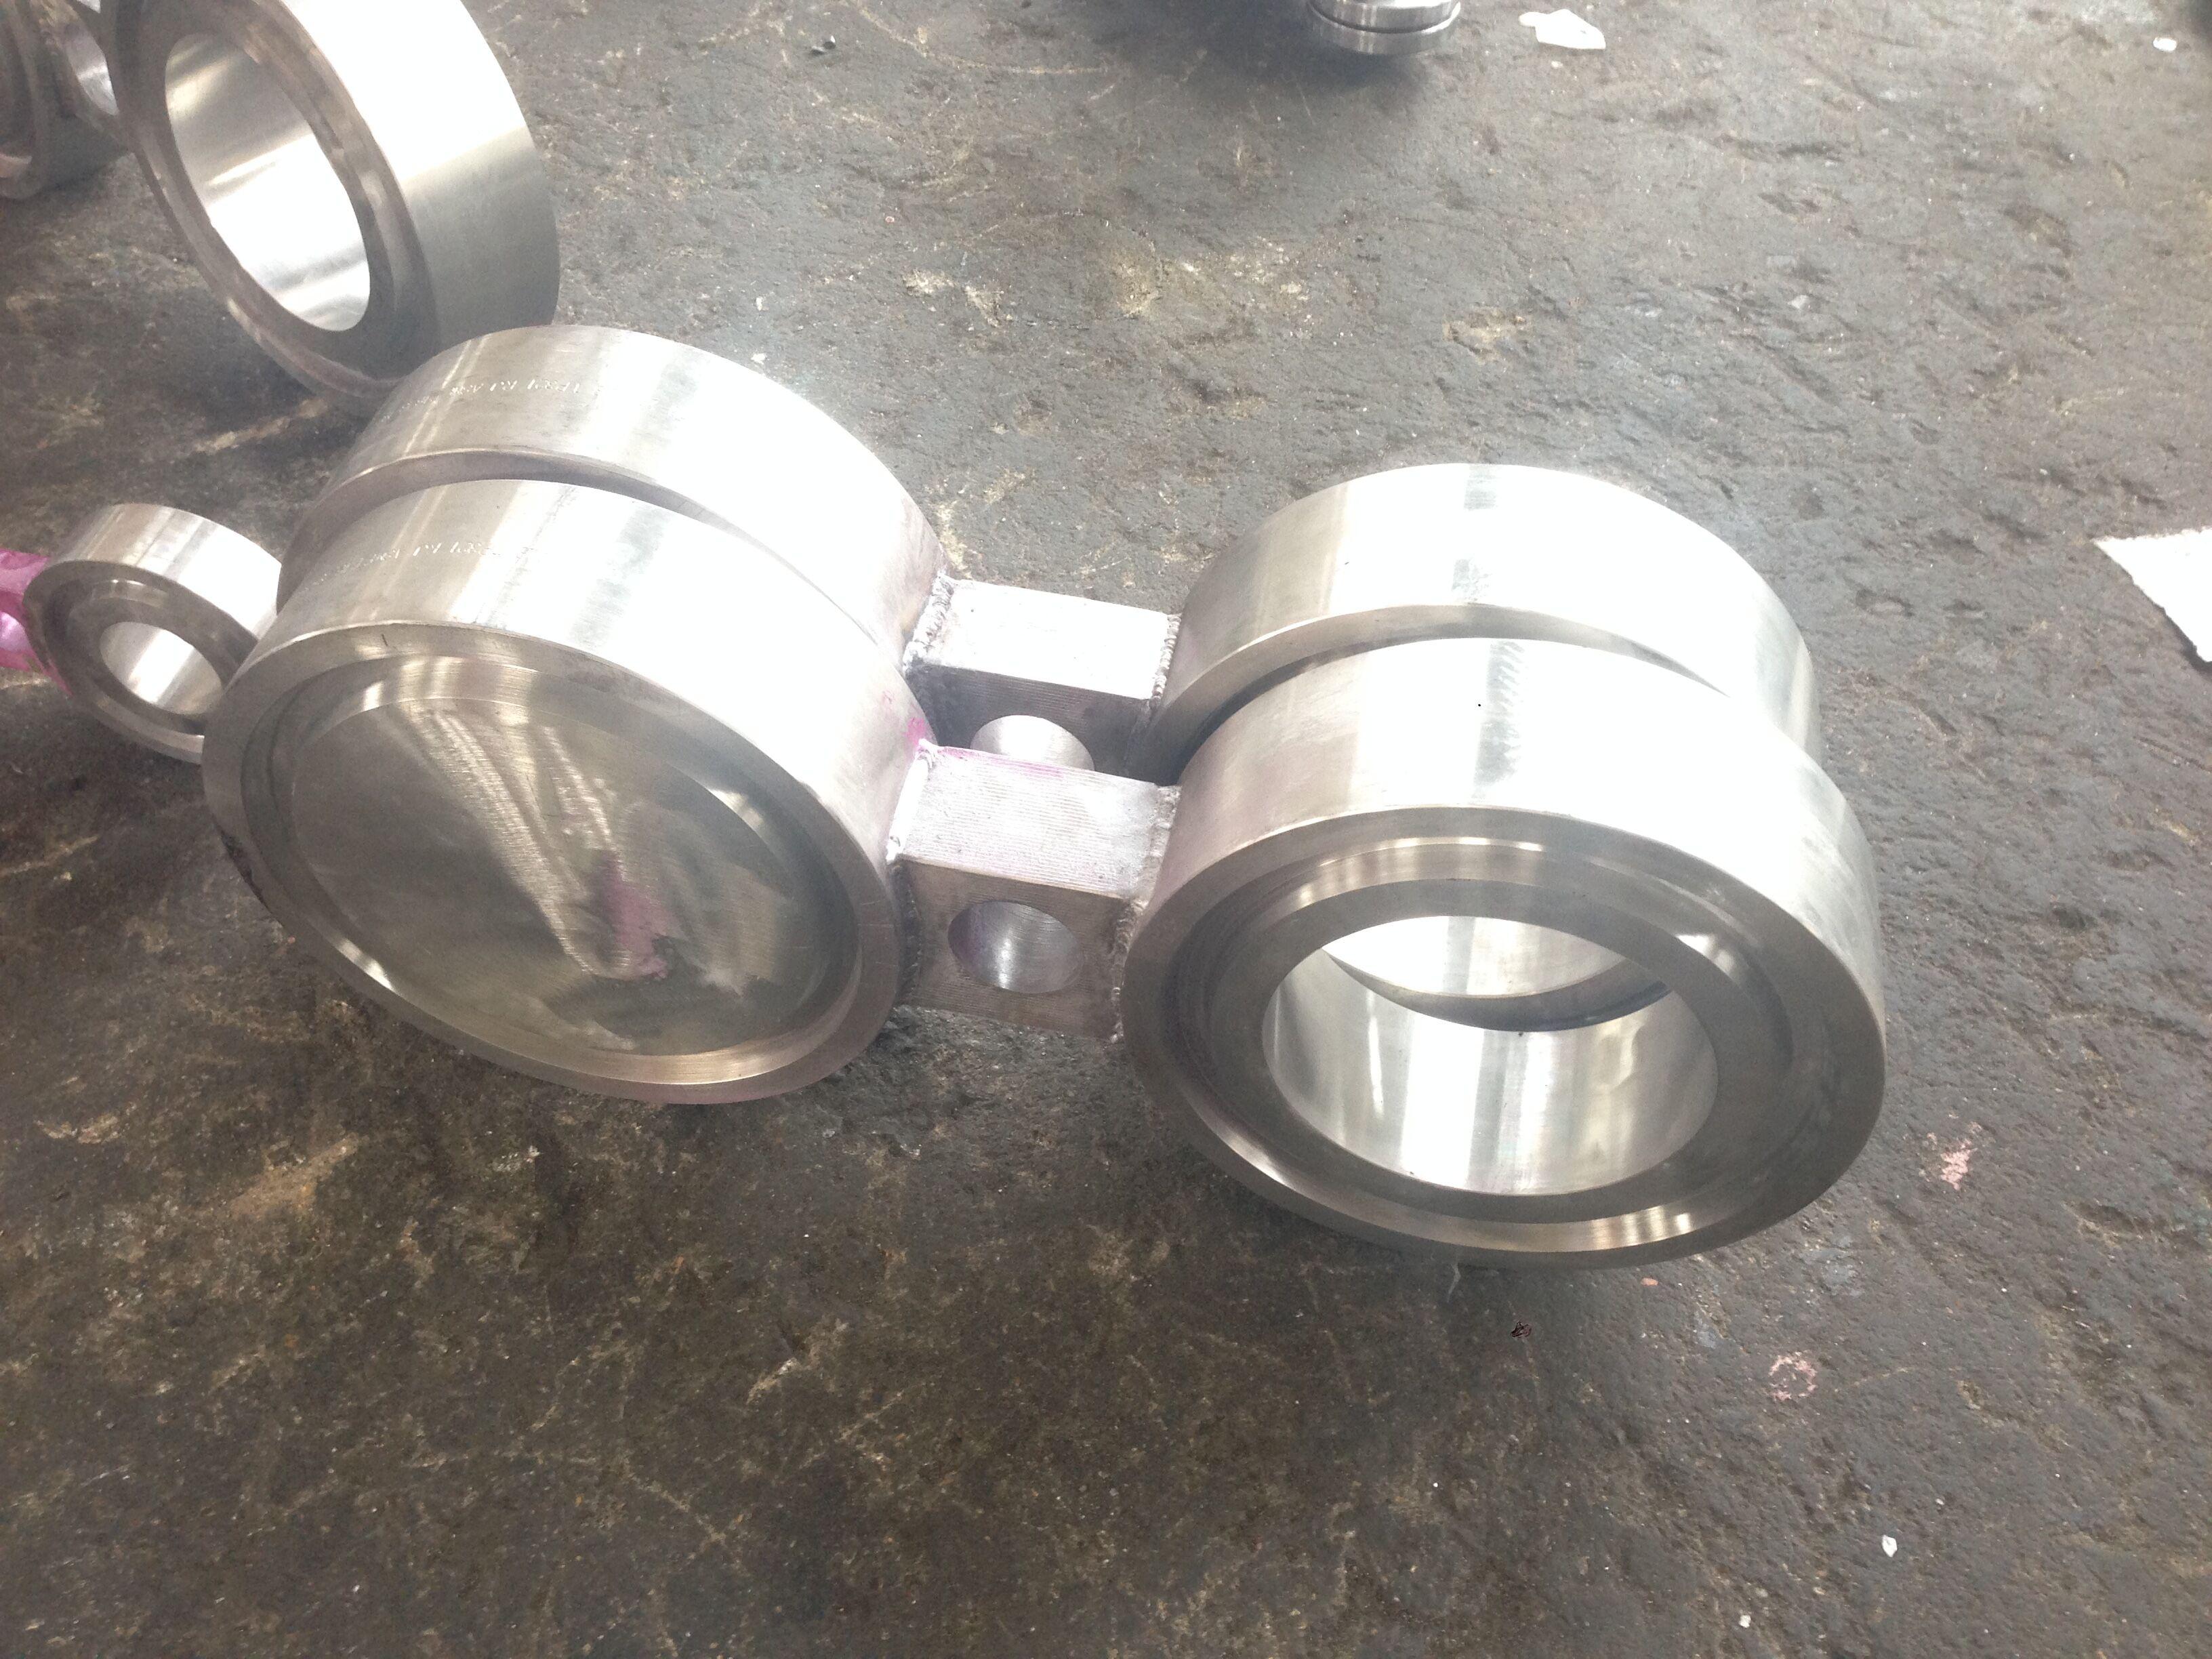 ASTM B462 UNS N08020 Blind Flange, Class 150 LB (PN20), Size 2 Inch (DN50), ASME B16.5, Raised Face